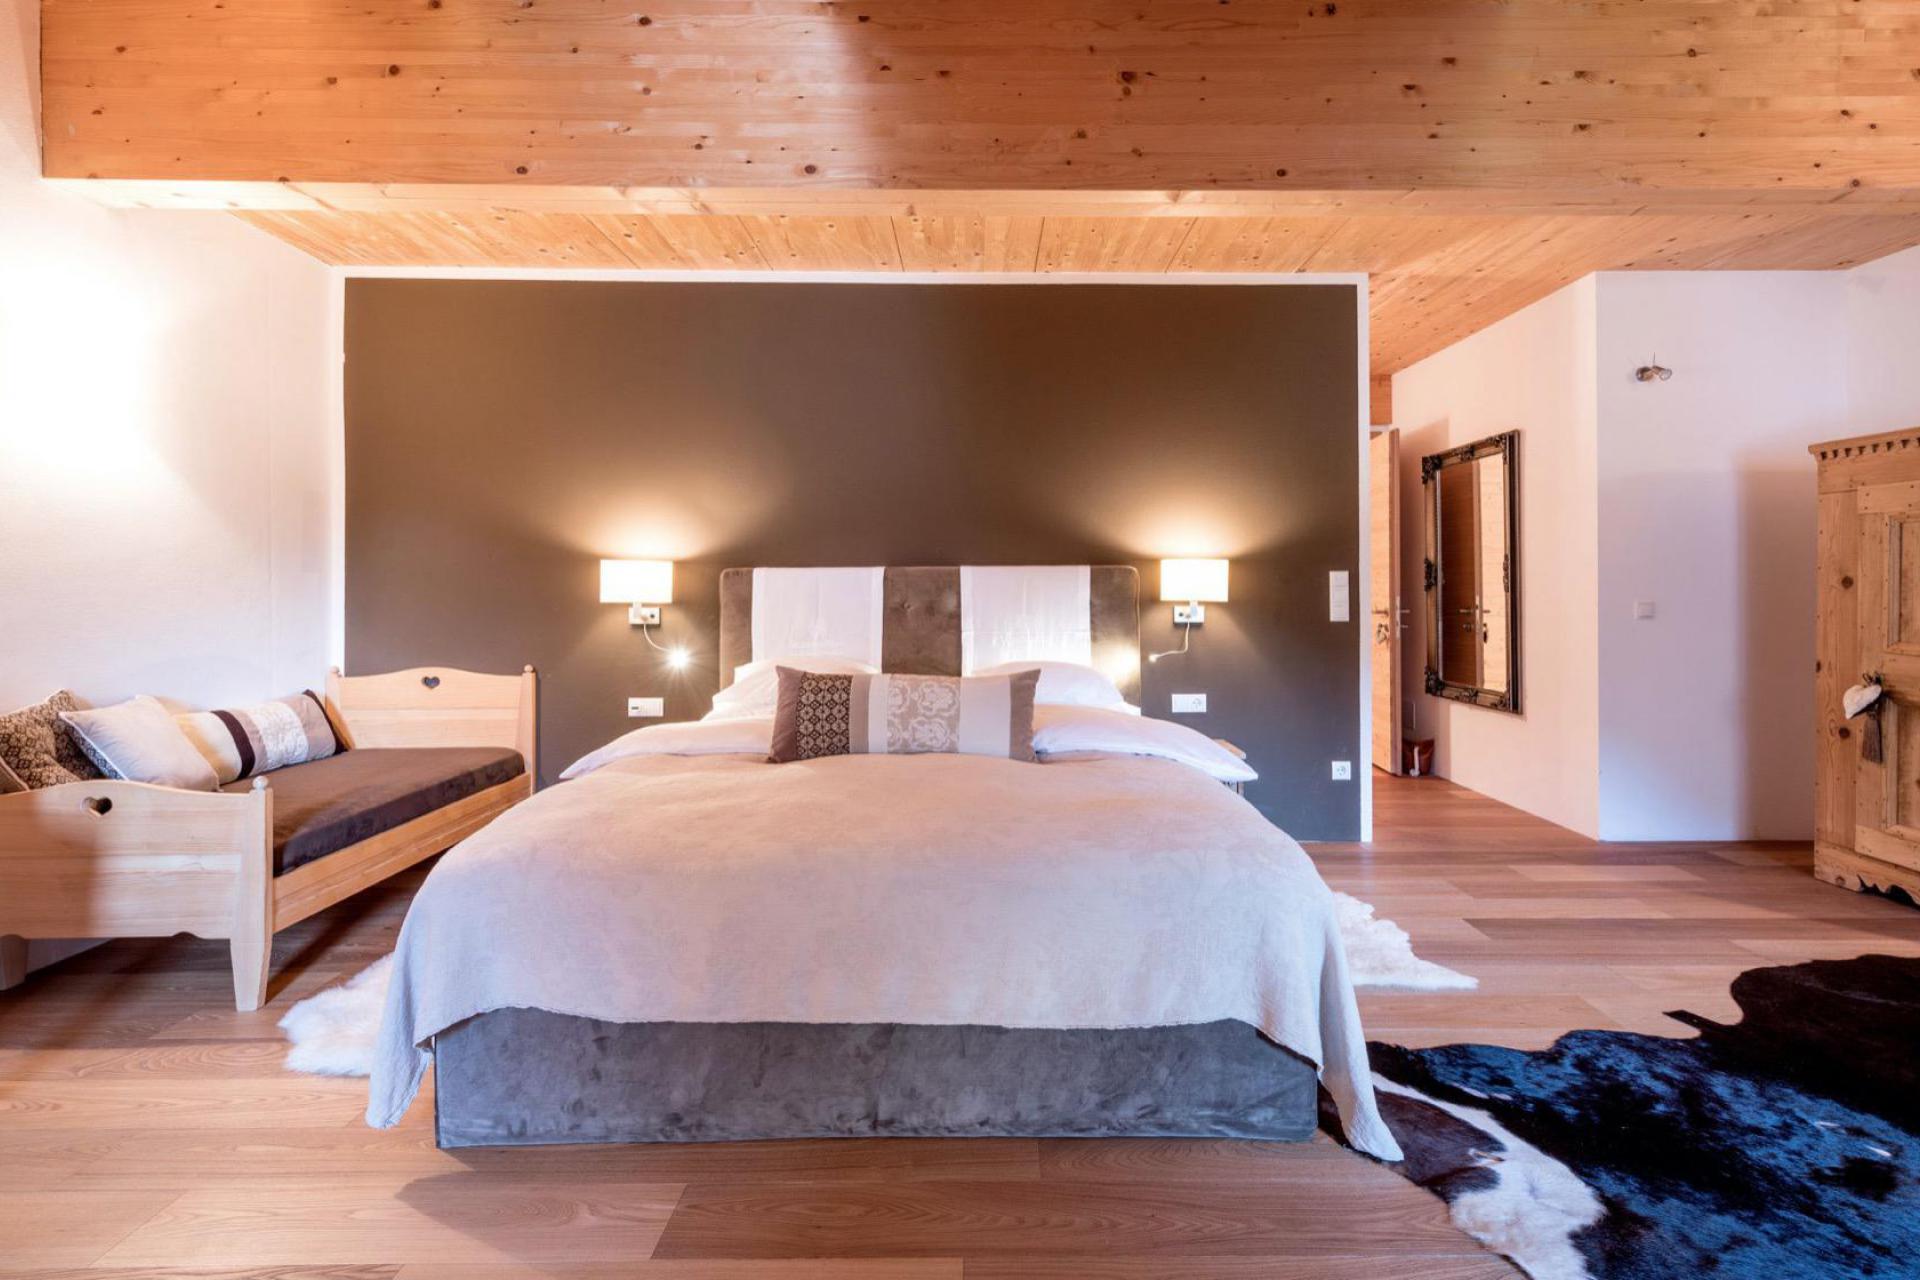 Agriturismo Dolomites Luxury agriturismo with B&B rooms and Sudtiroler hospitality